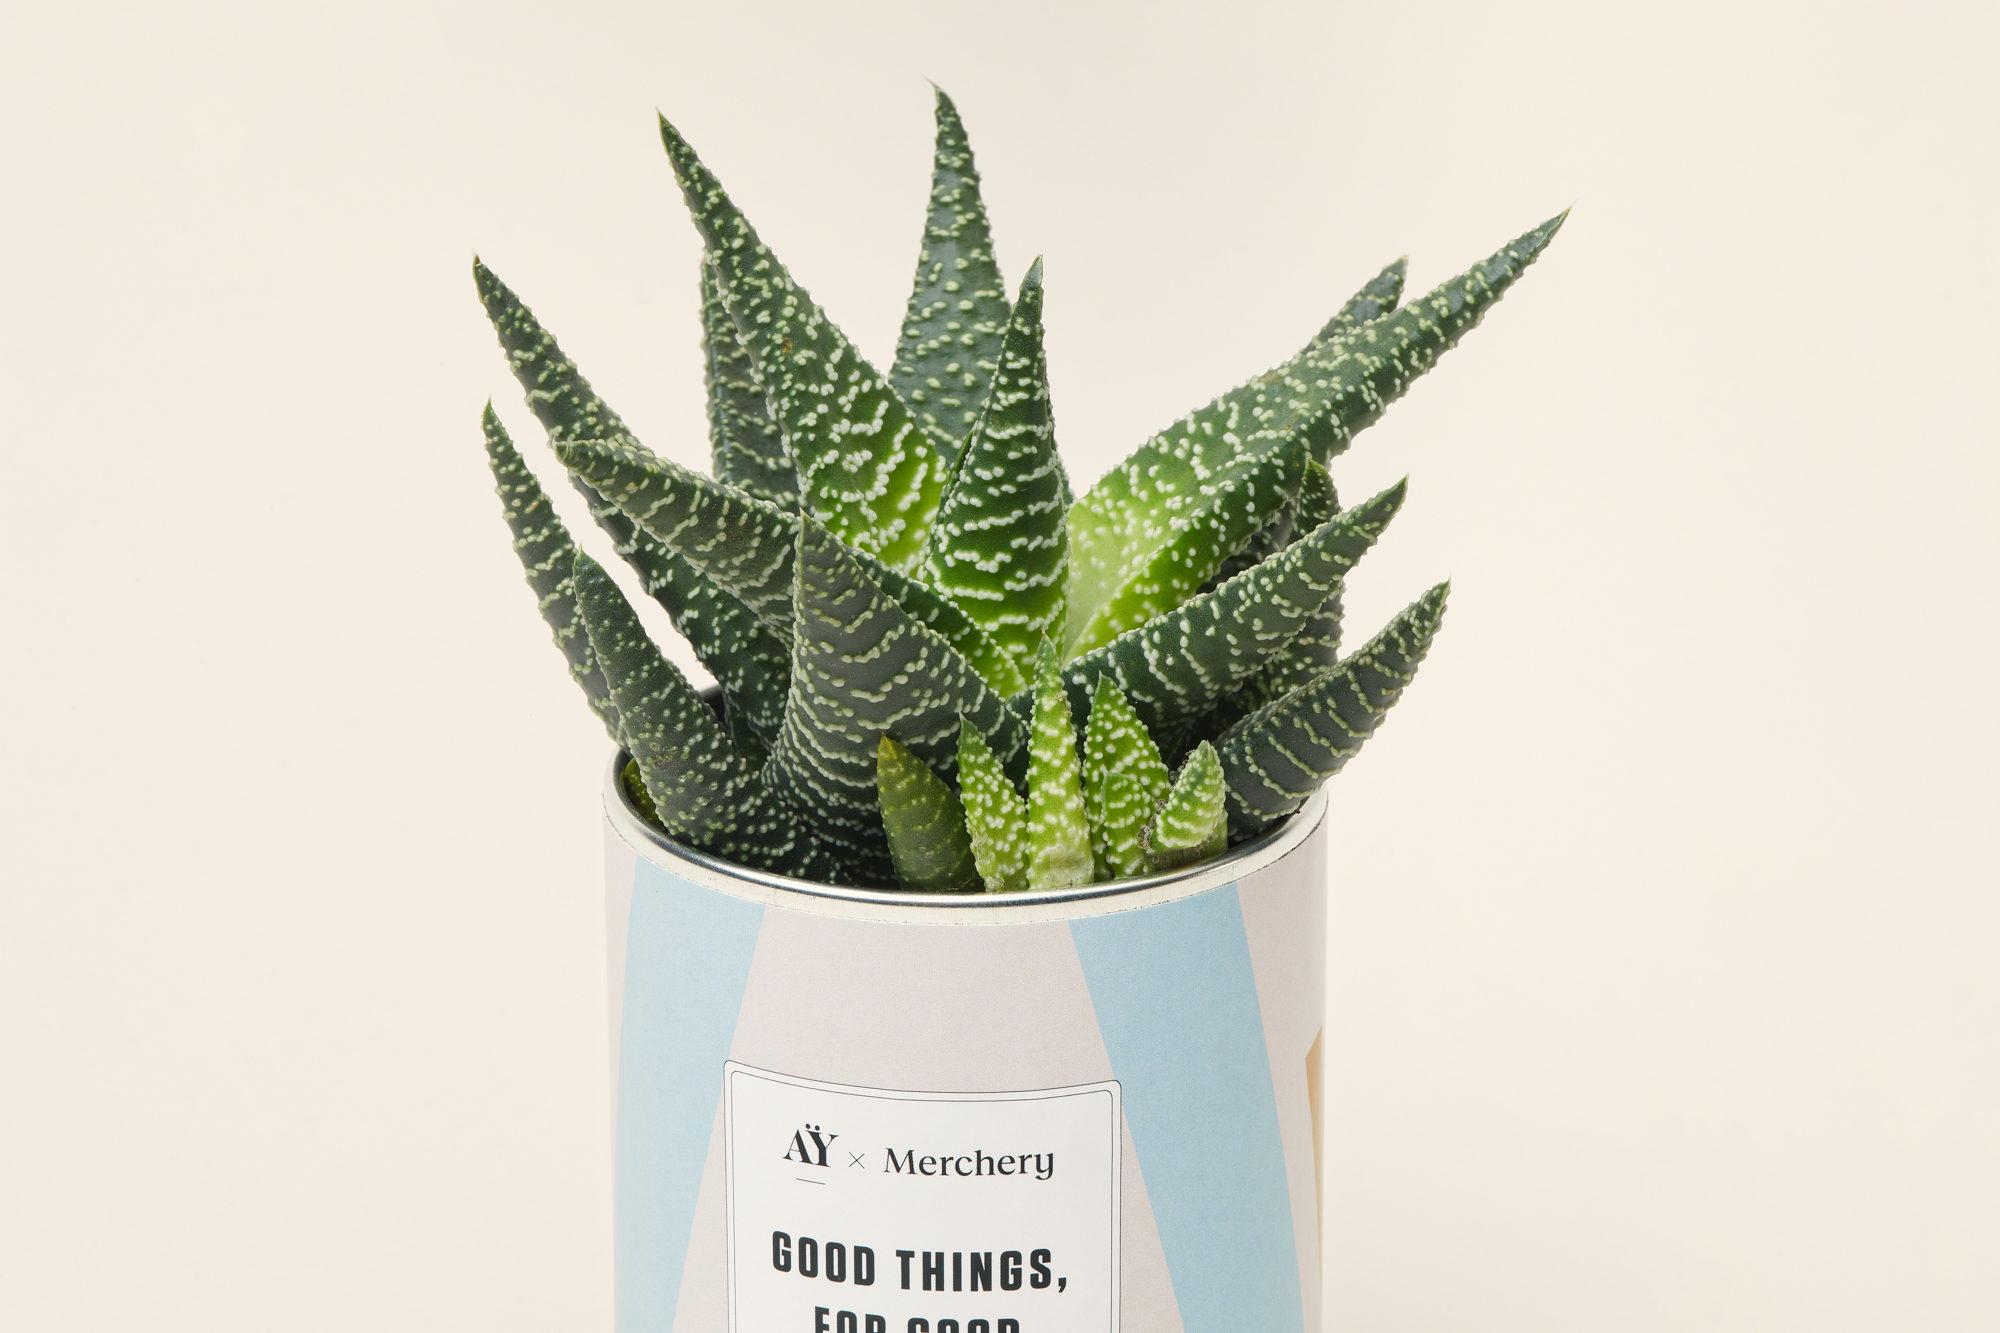 AY Cactus - Branded Plant Gift - Merchery